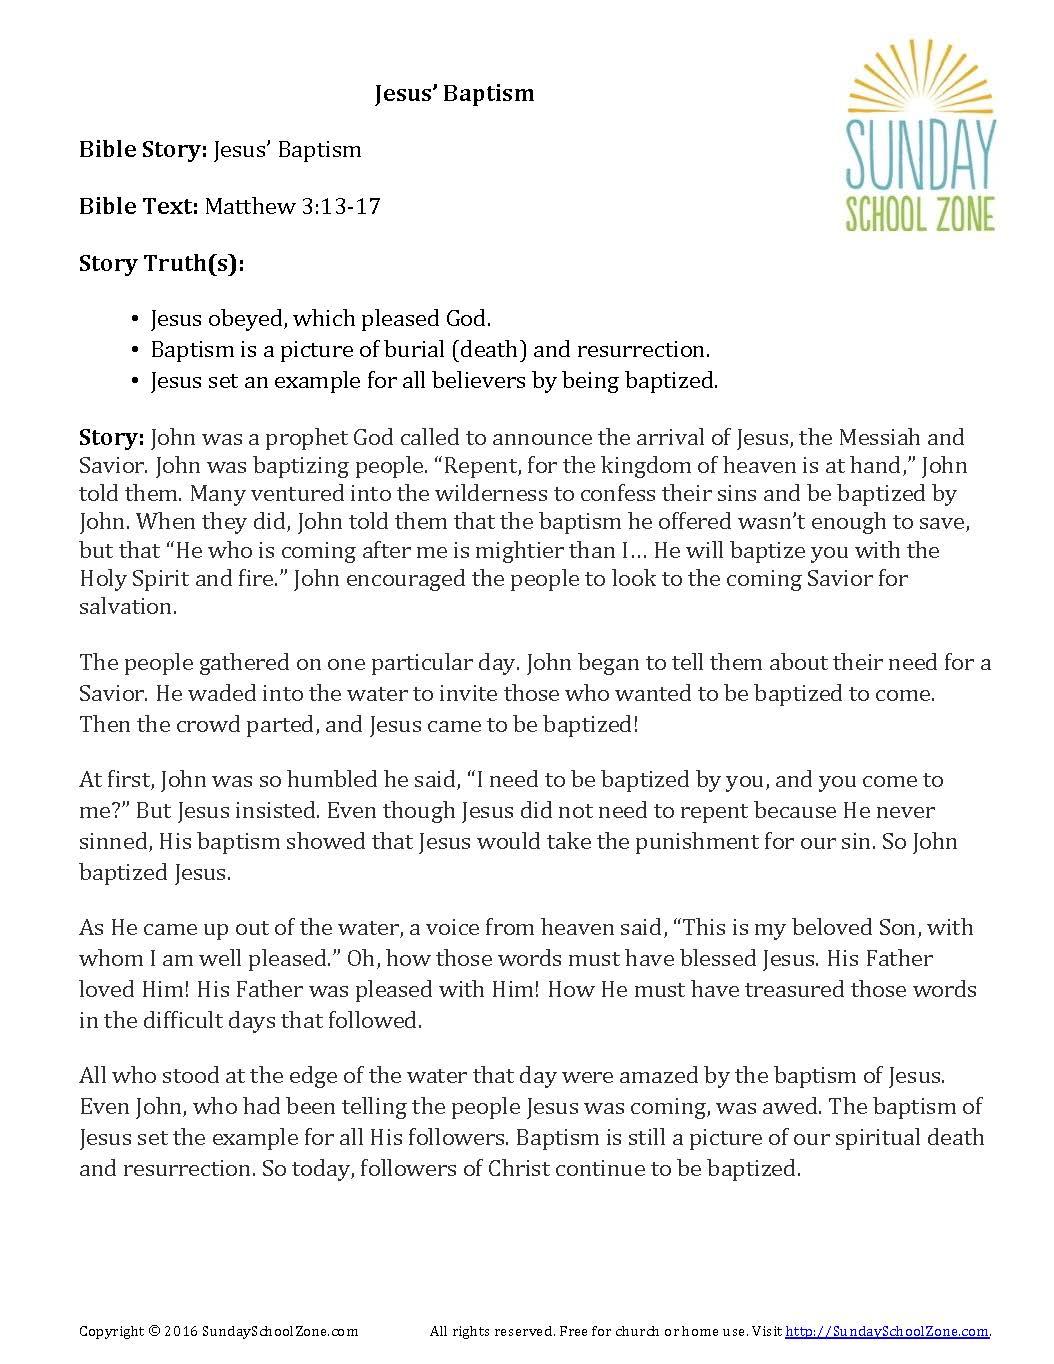 jesus baptism story summary children s bible activities sunday